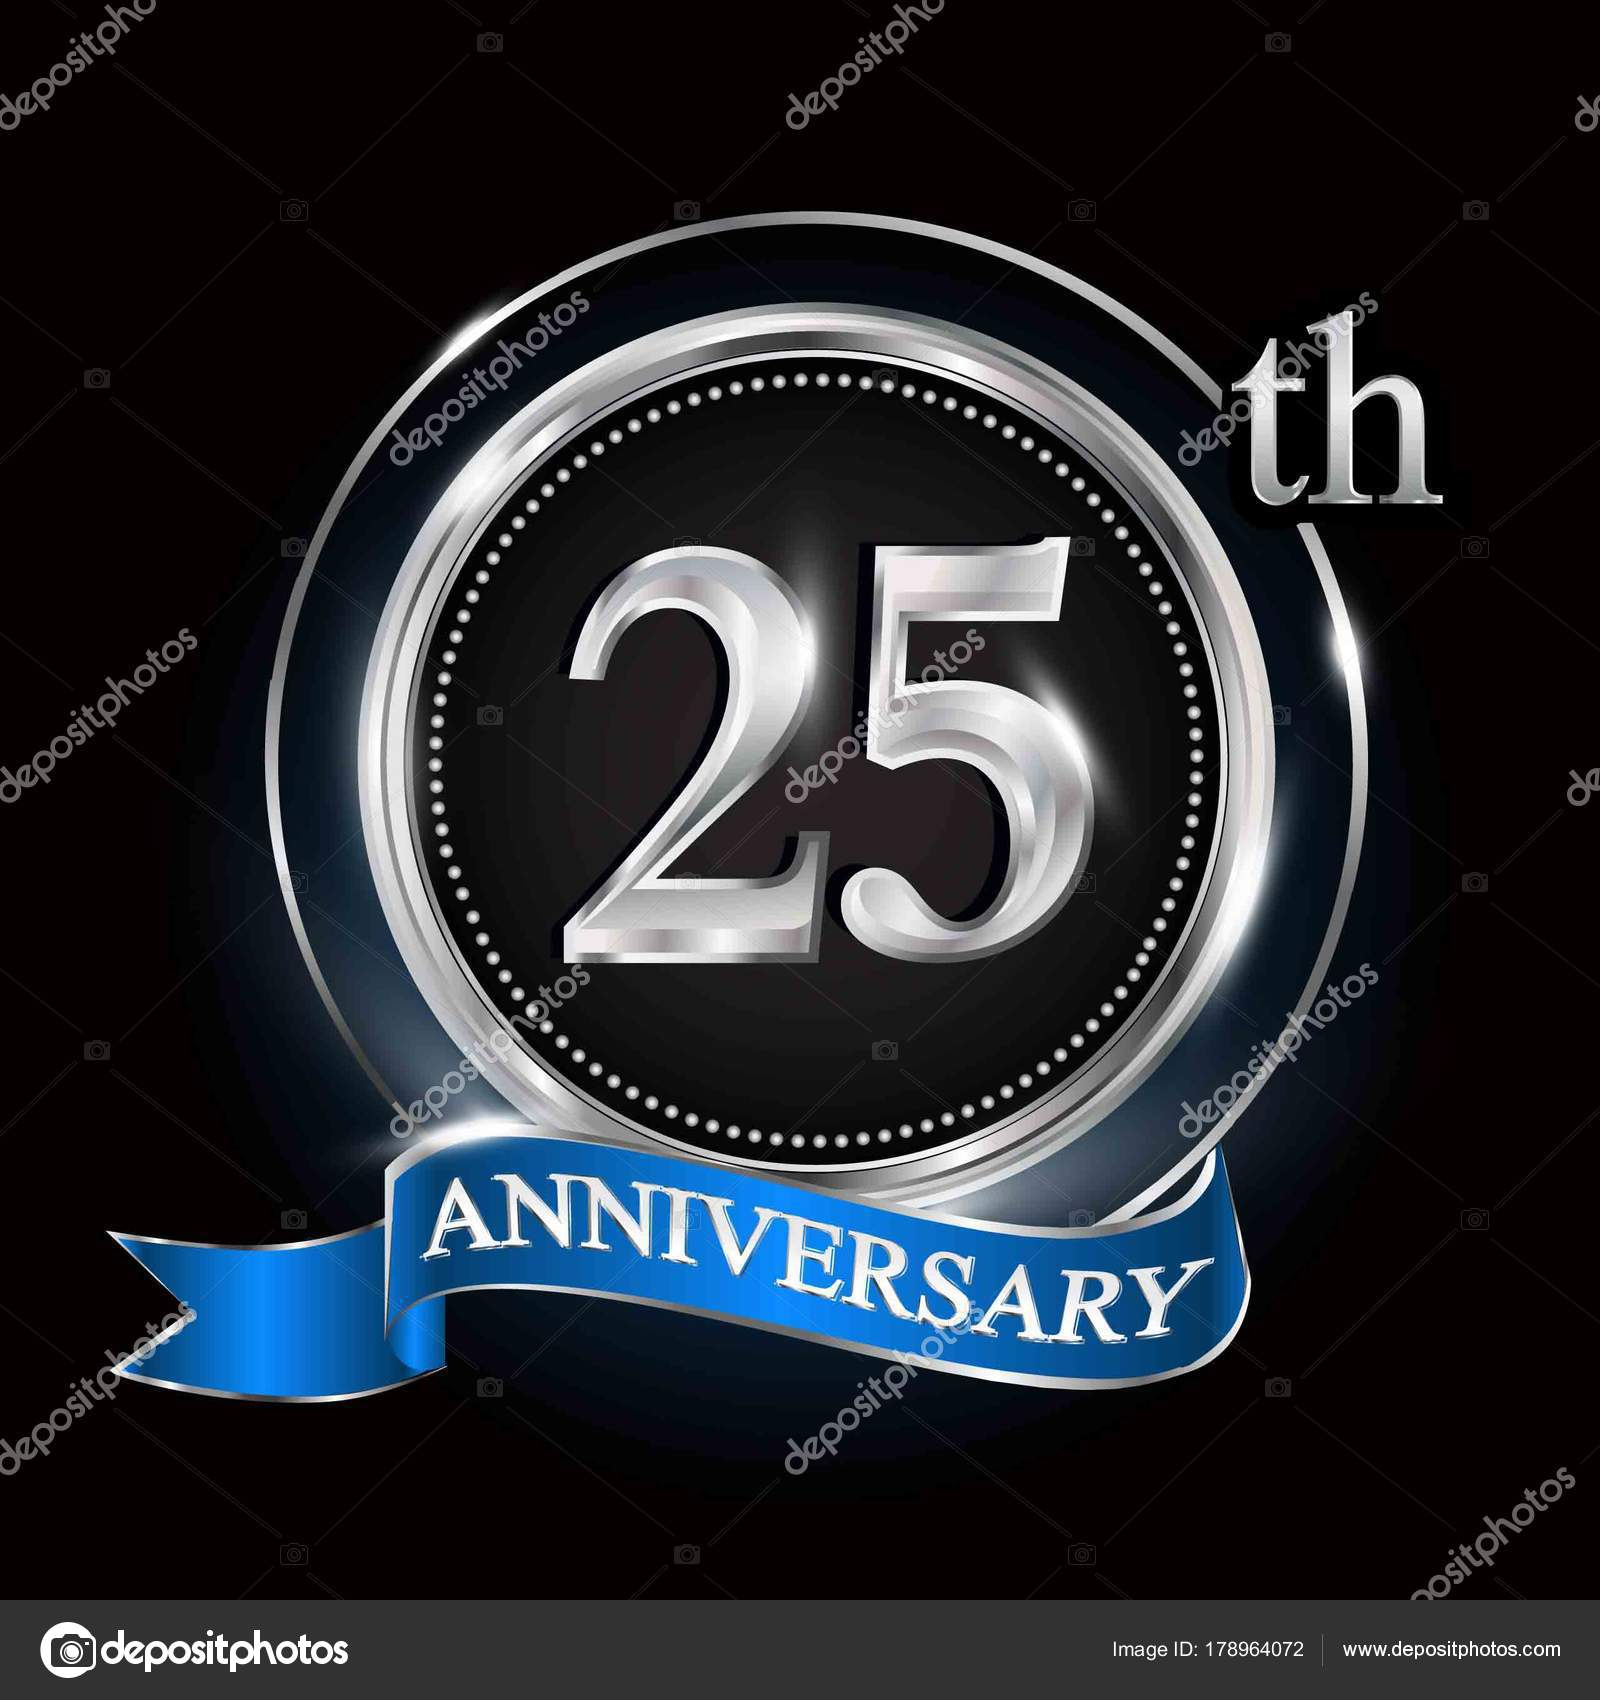 25th anniversary logo silver ring blue ribbon stock vector rh depositphotos com 25th Anniversary Seal 25th Anniversary Quotes